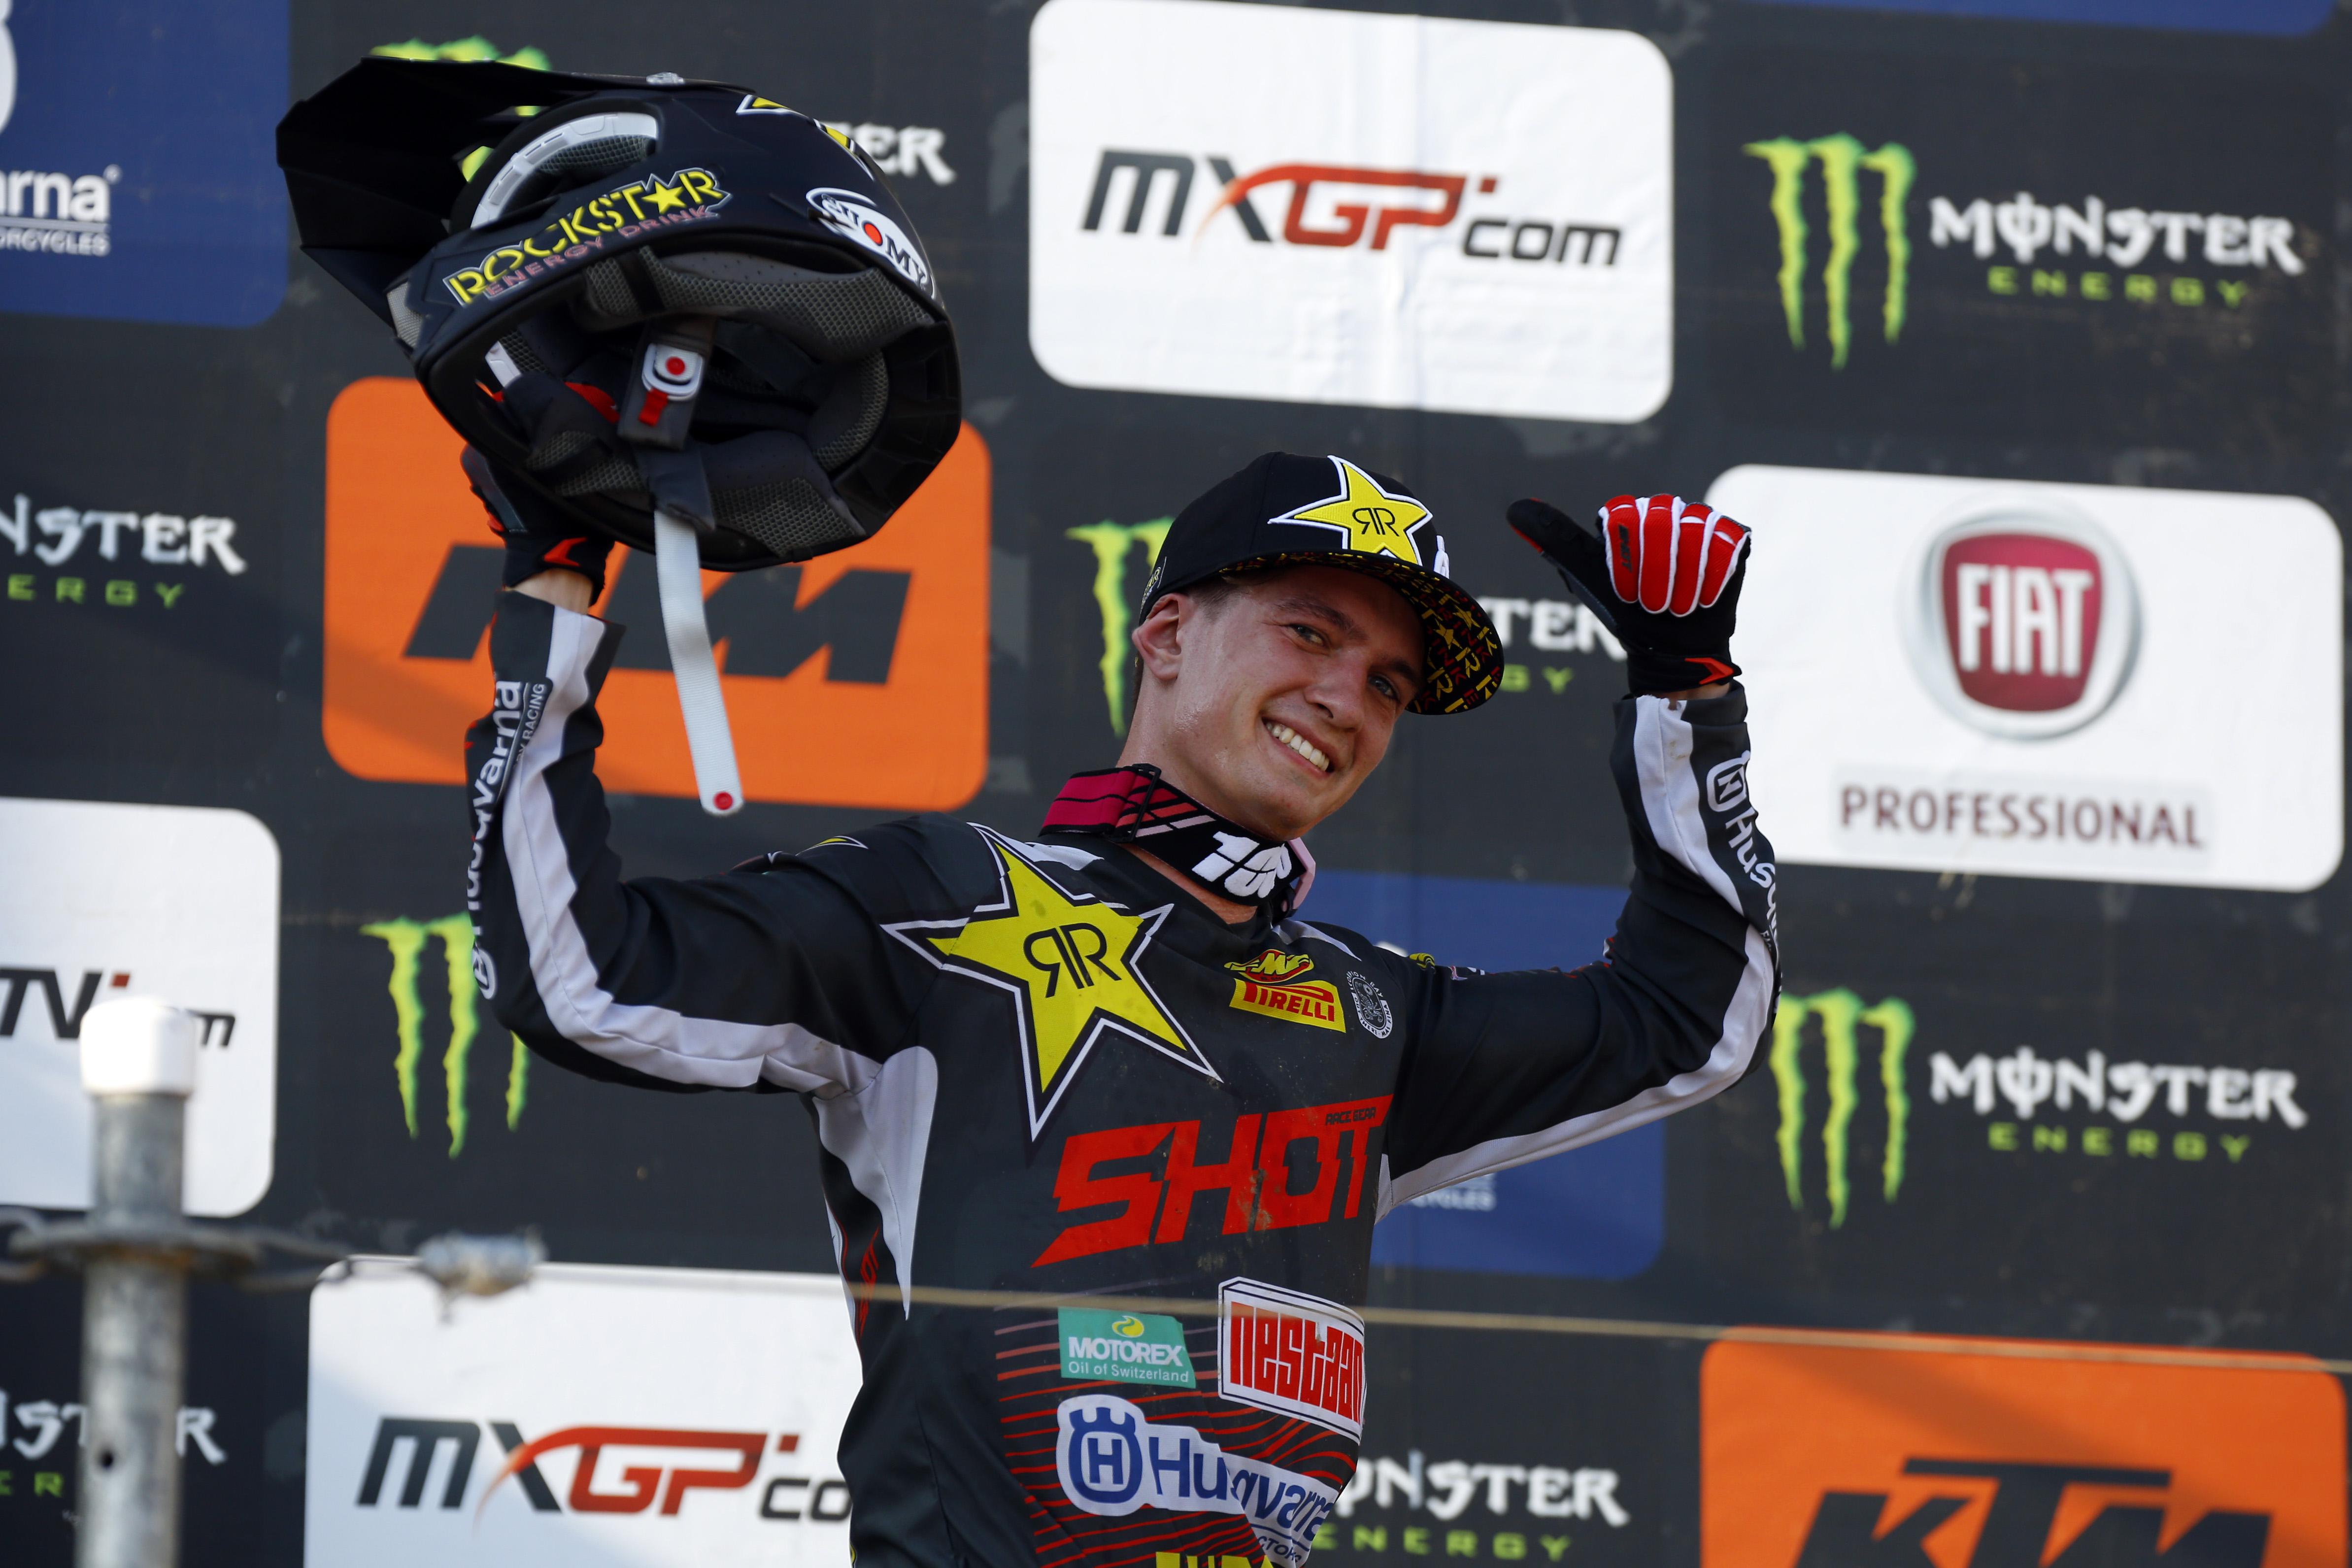 pirelli - covington podium - GP of Italy